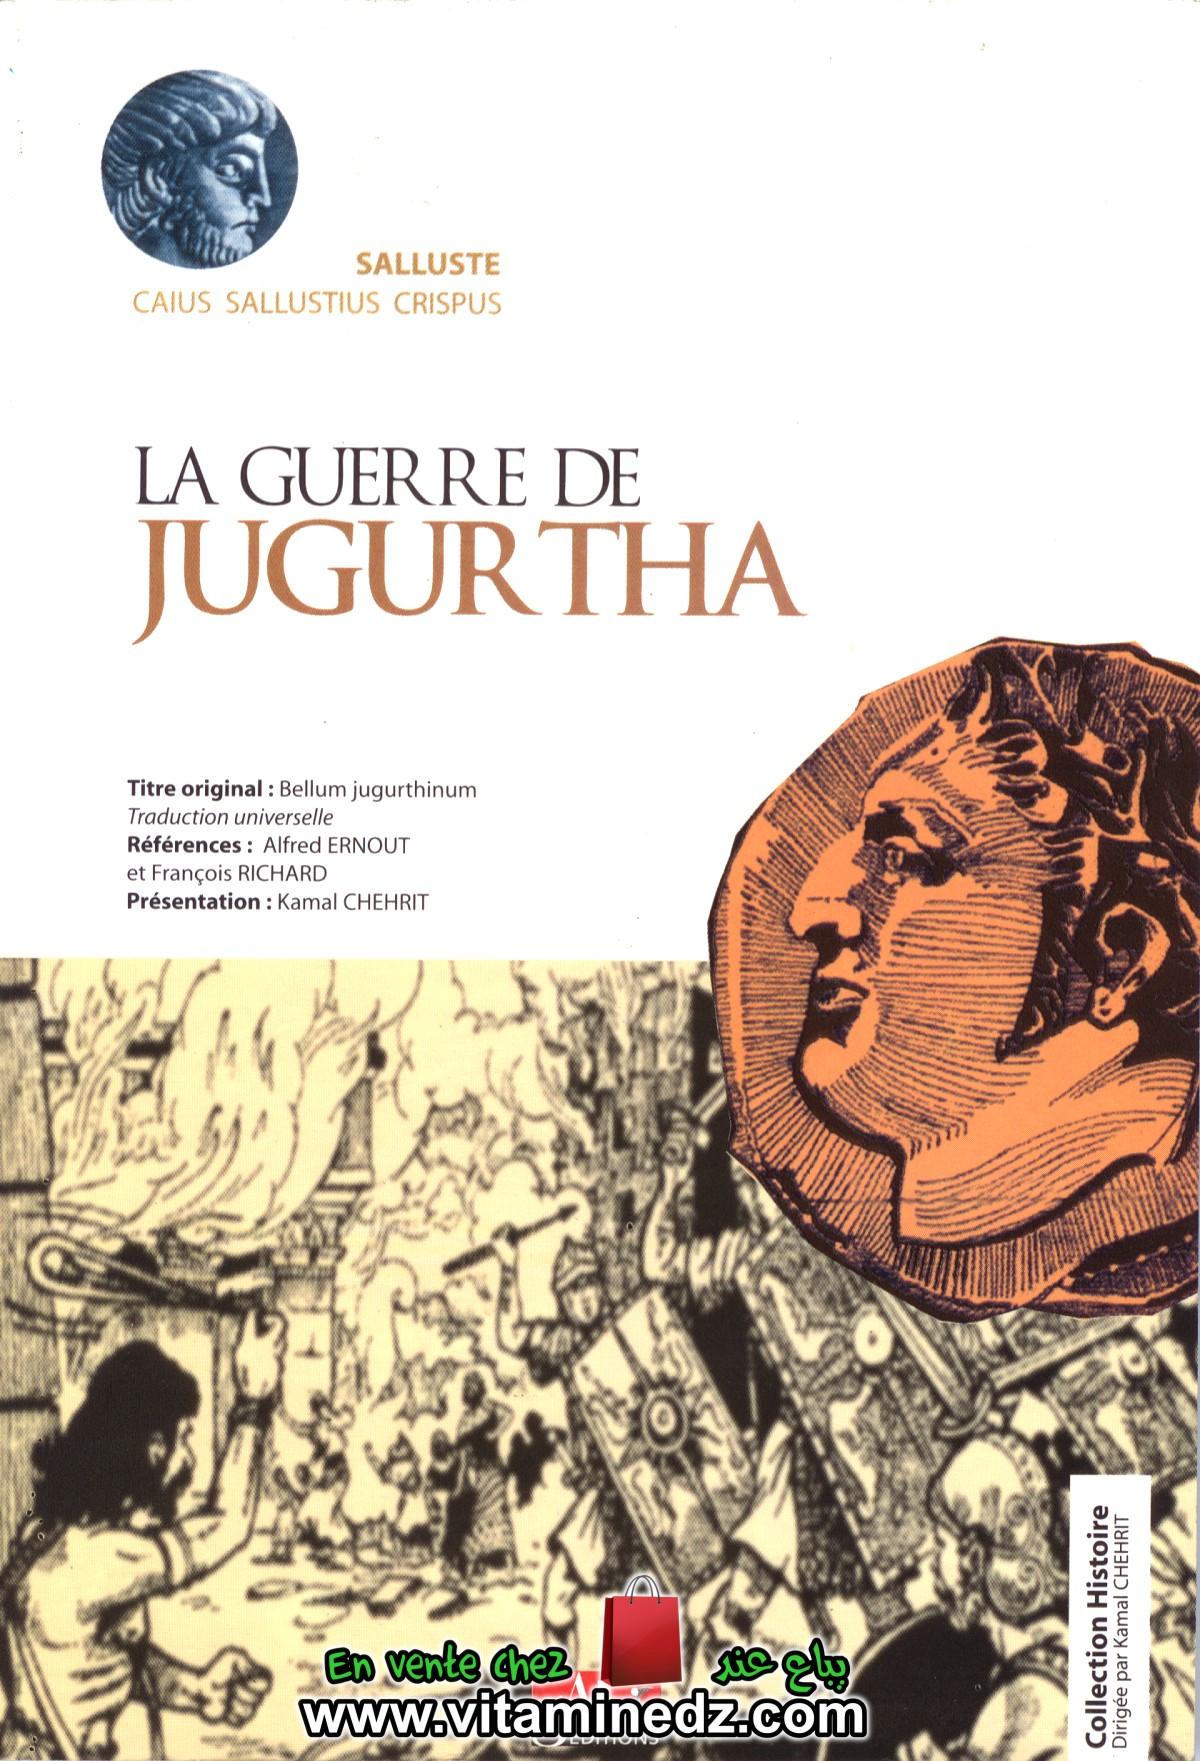 La guerre de Jugurtha - Salluste